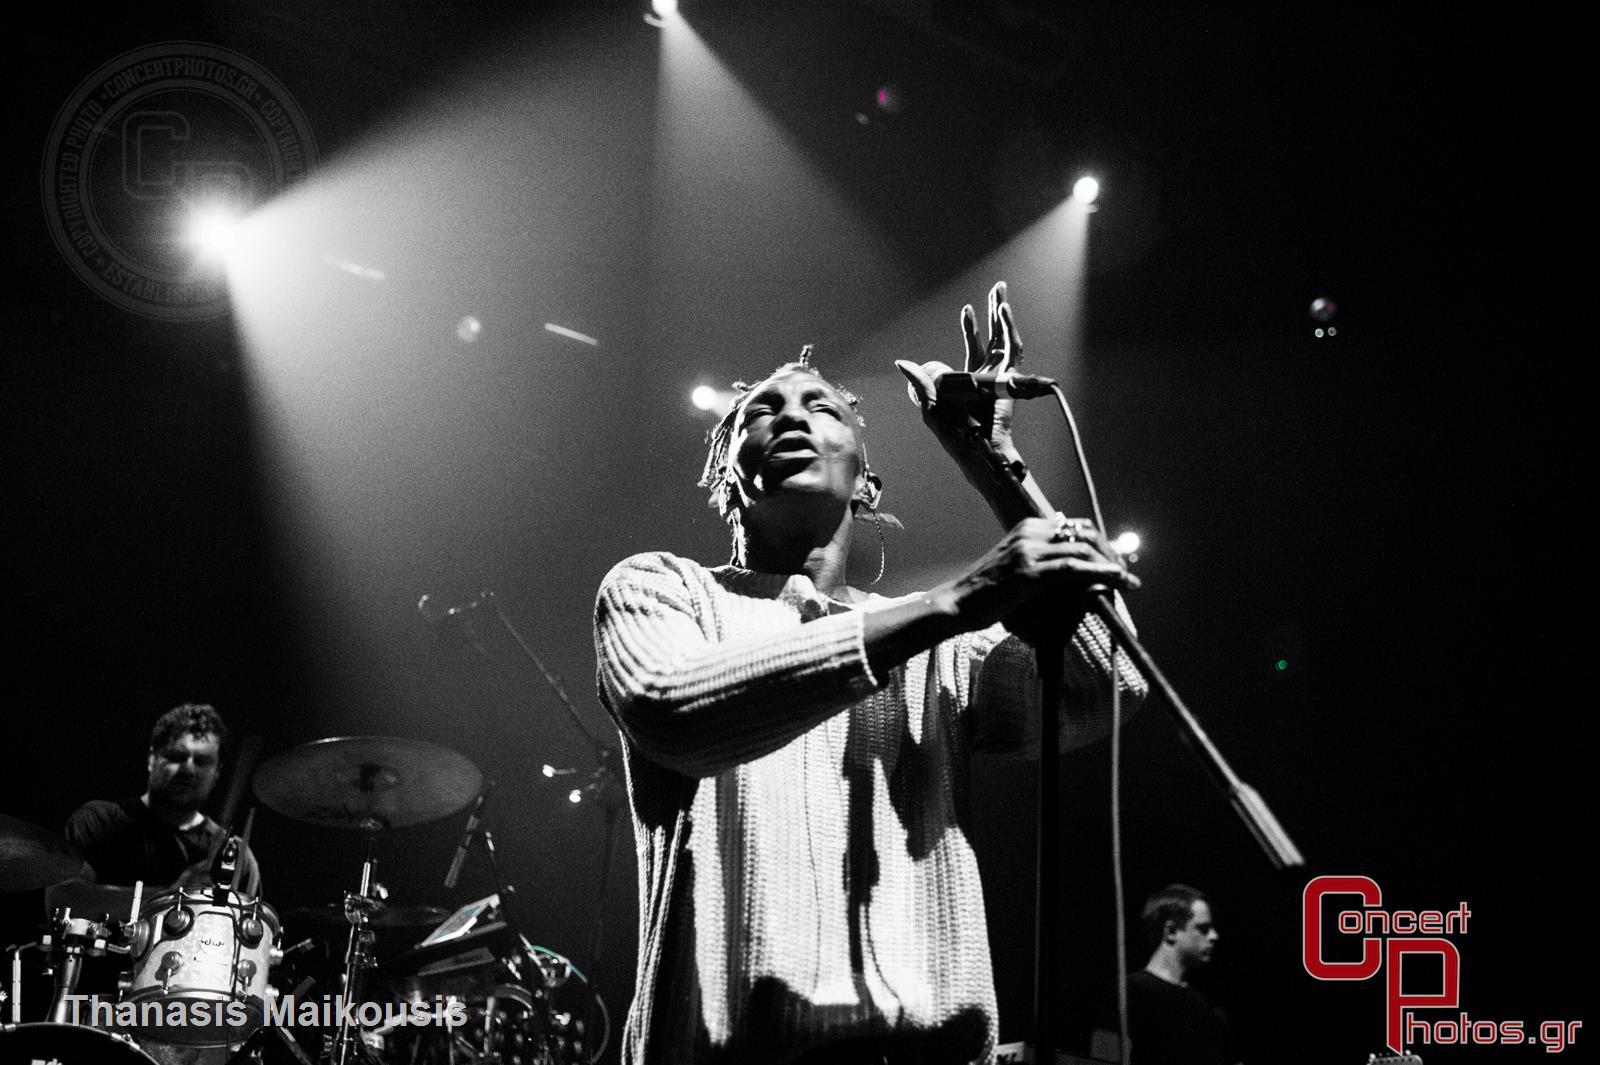 Tricky - Spectralfire-Tricky - Spectralfire photographer: Thanasis Maikousis - concertphotos_-3708